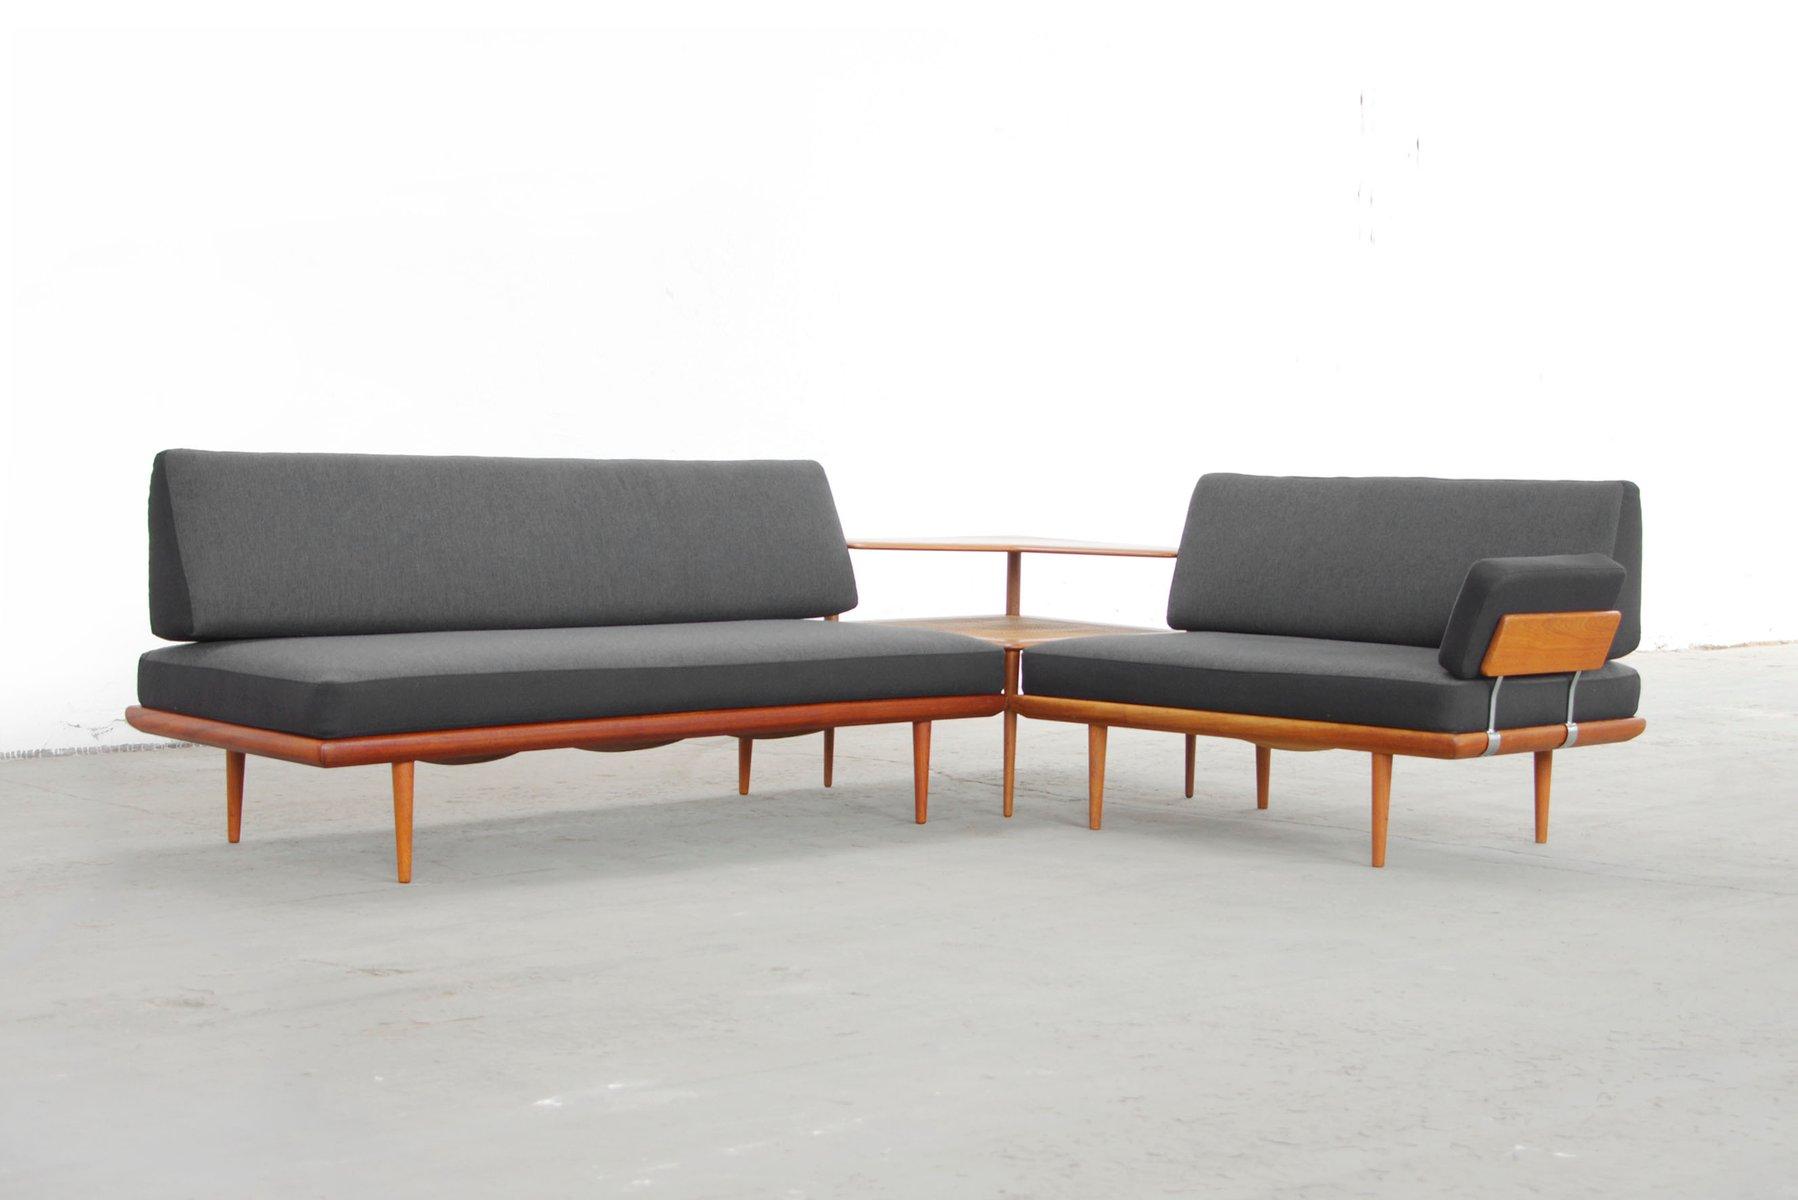 Danish teak minerva sofa system by peter hvidt and orla m lgaard nielsen for sale at pamono